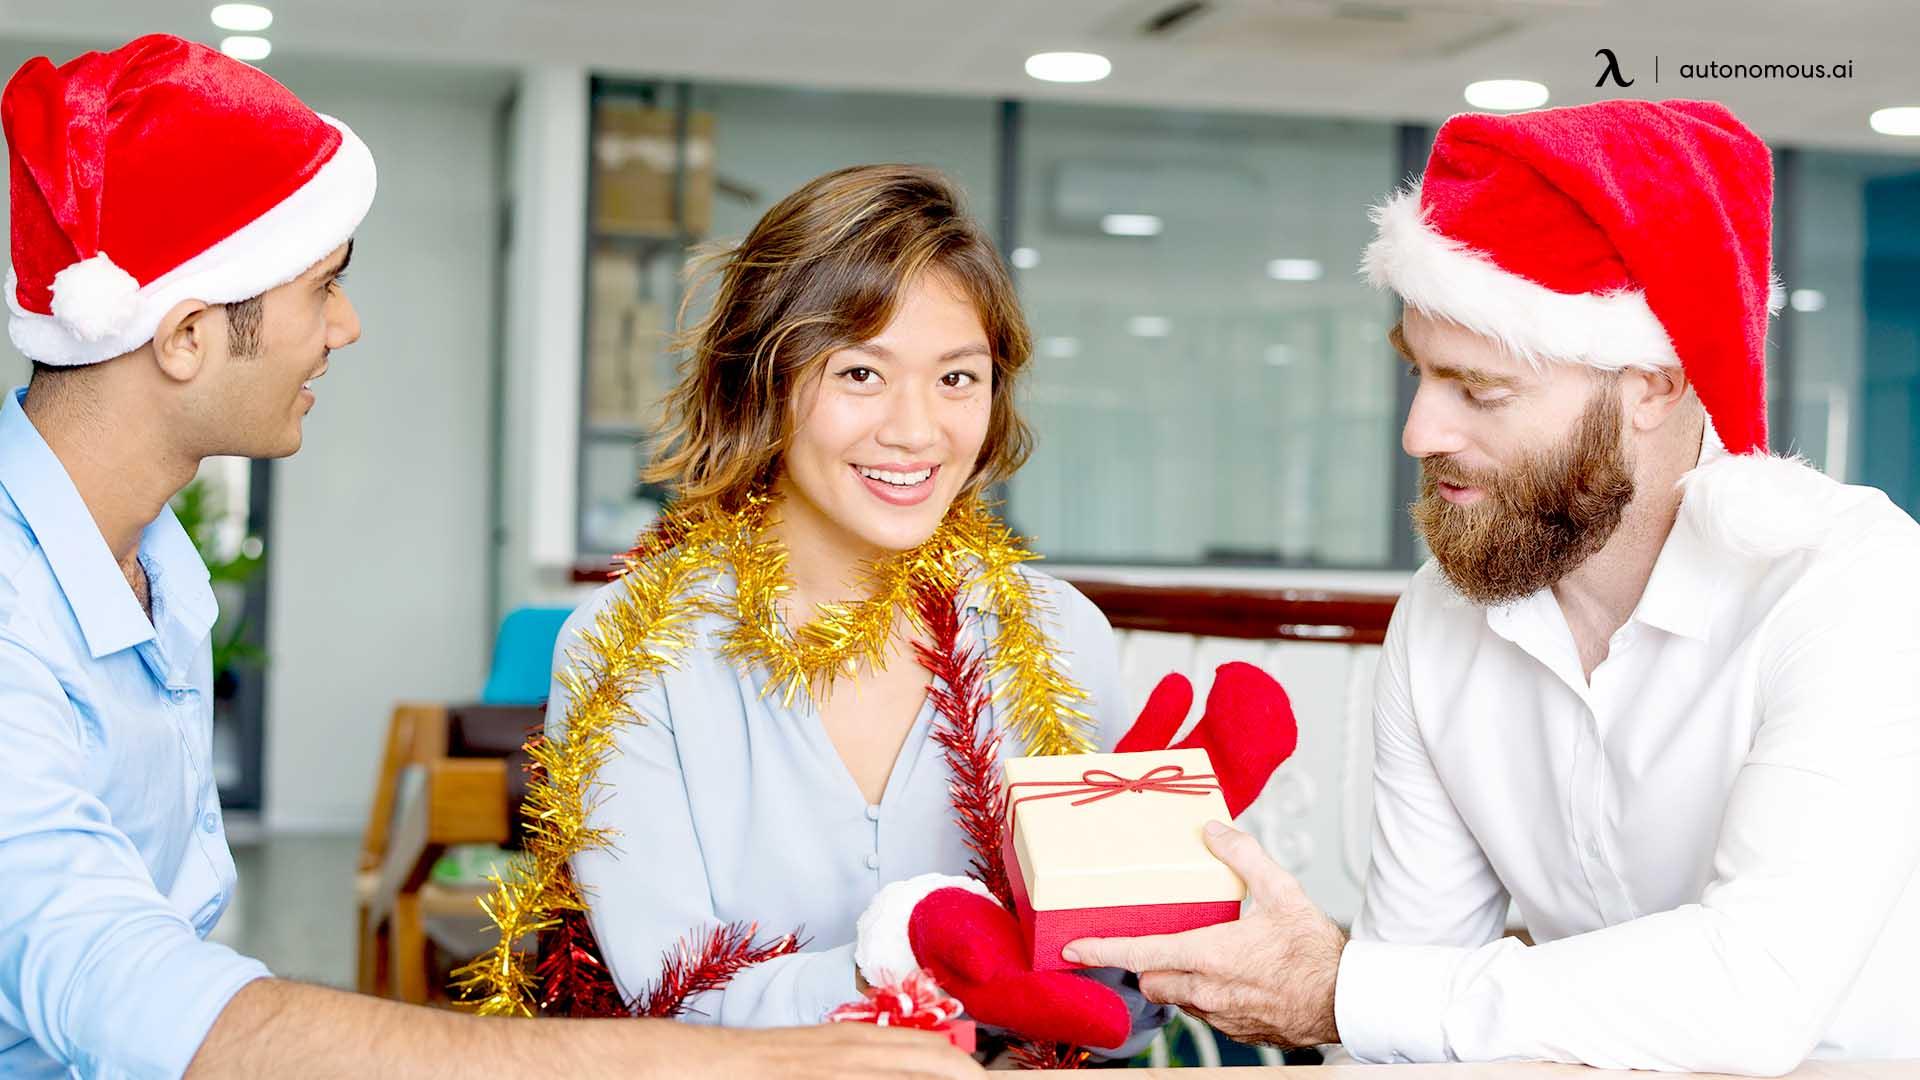 It helps boost employee work satisfaction